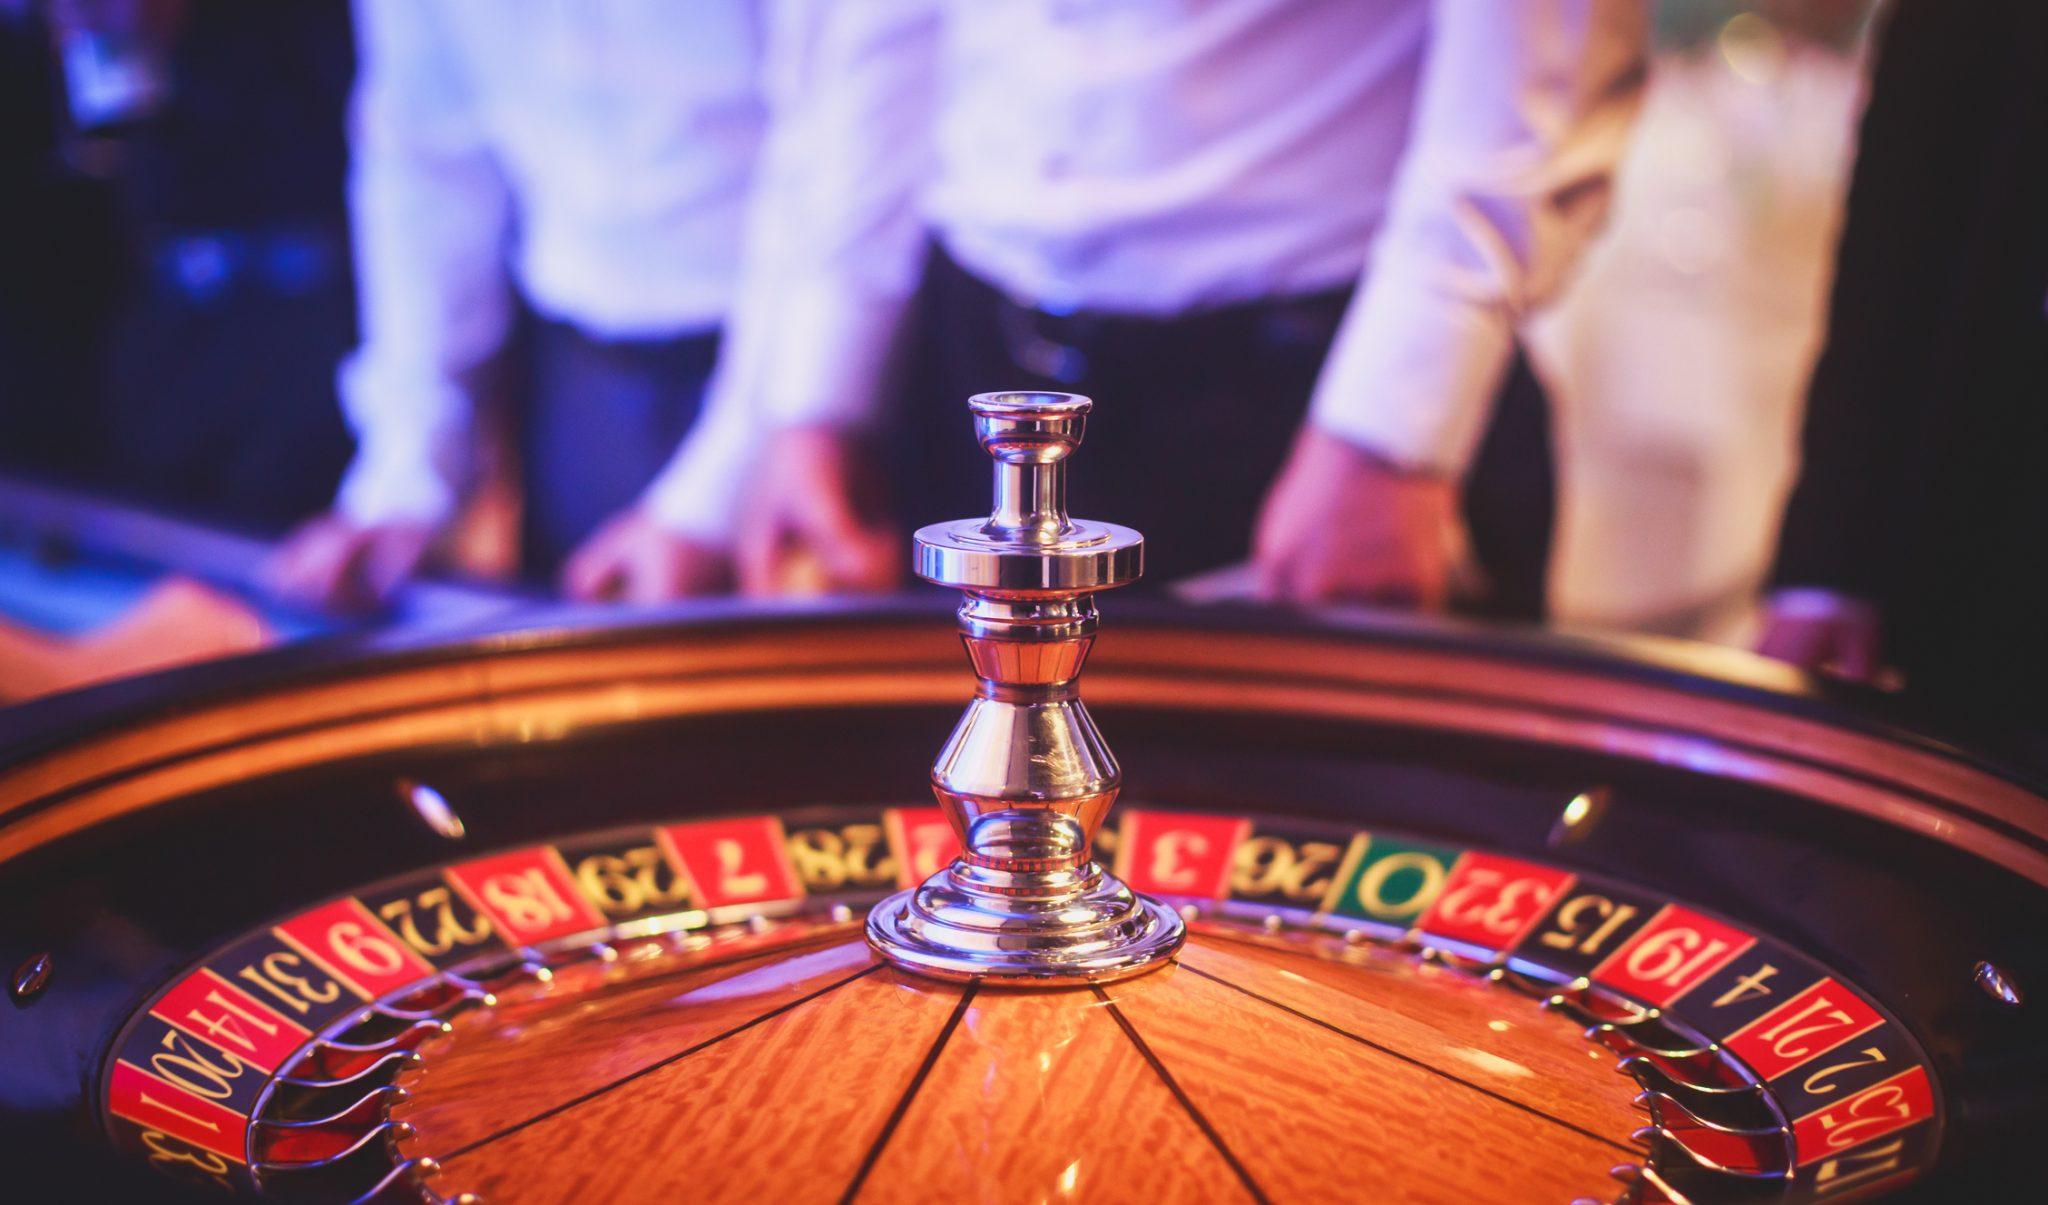 Gambling etf procter of procter and gamble